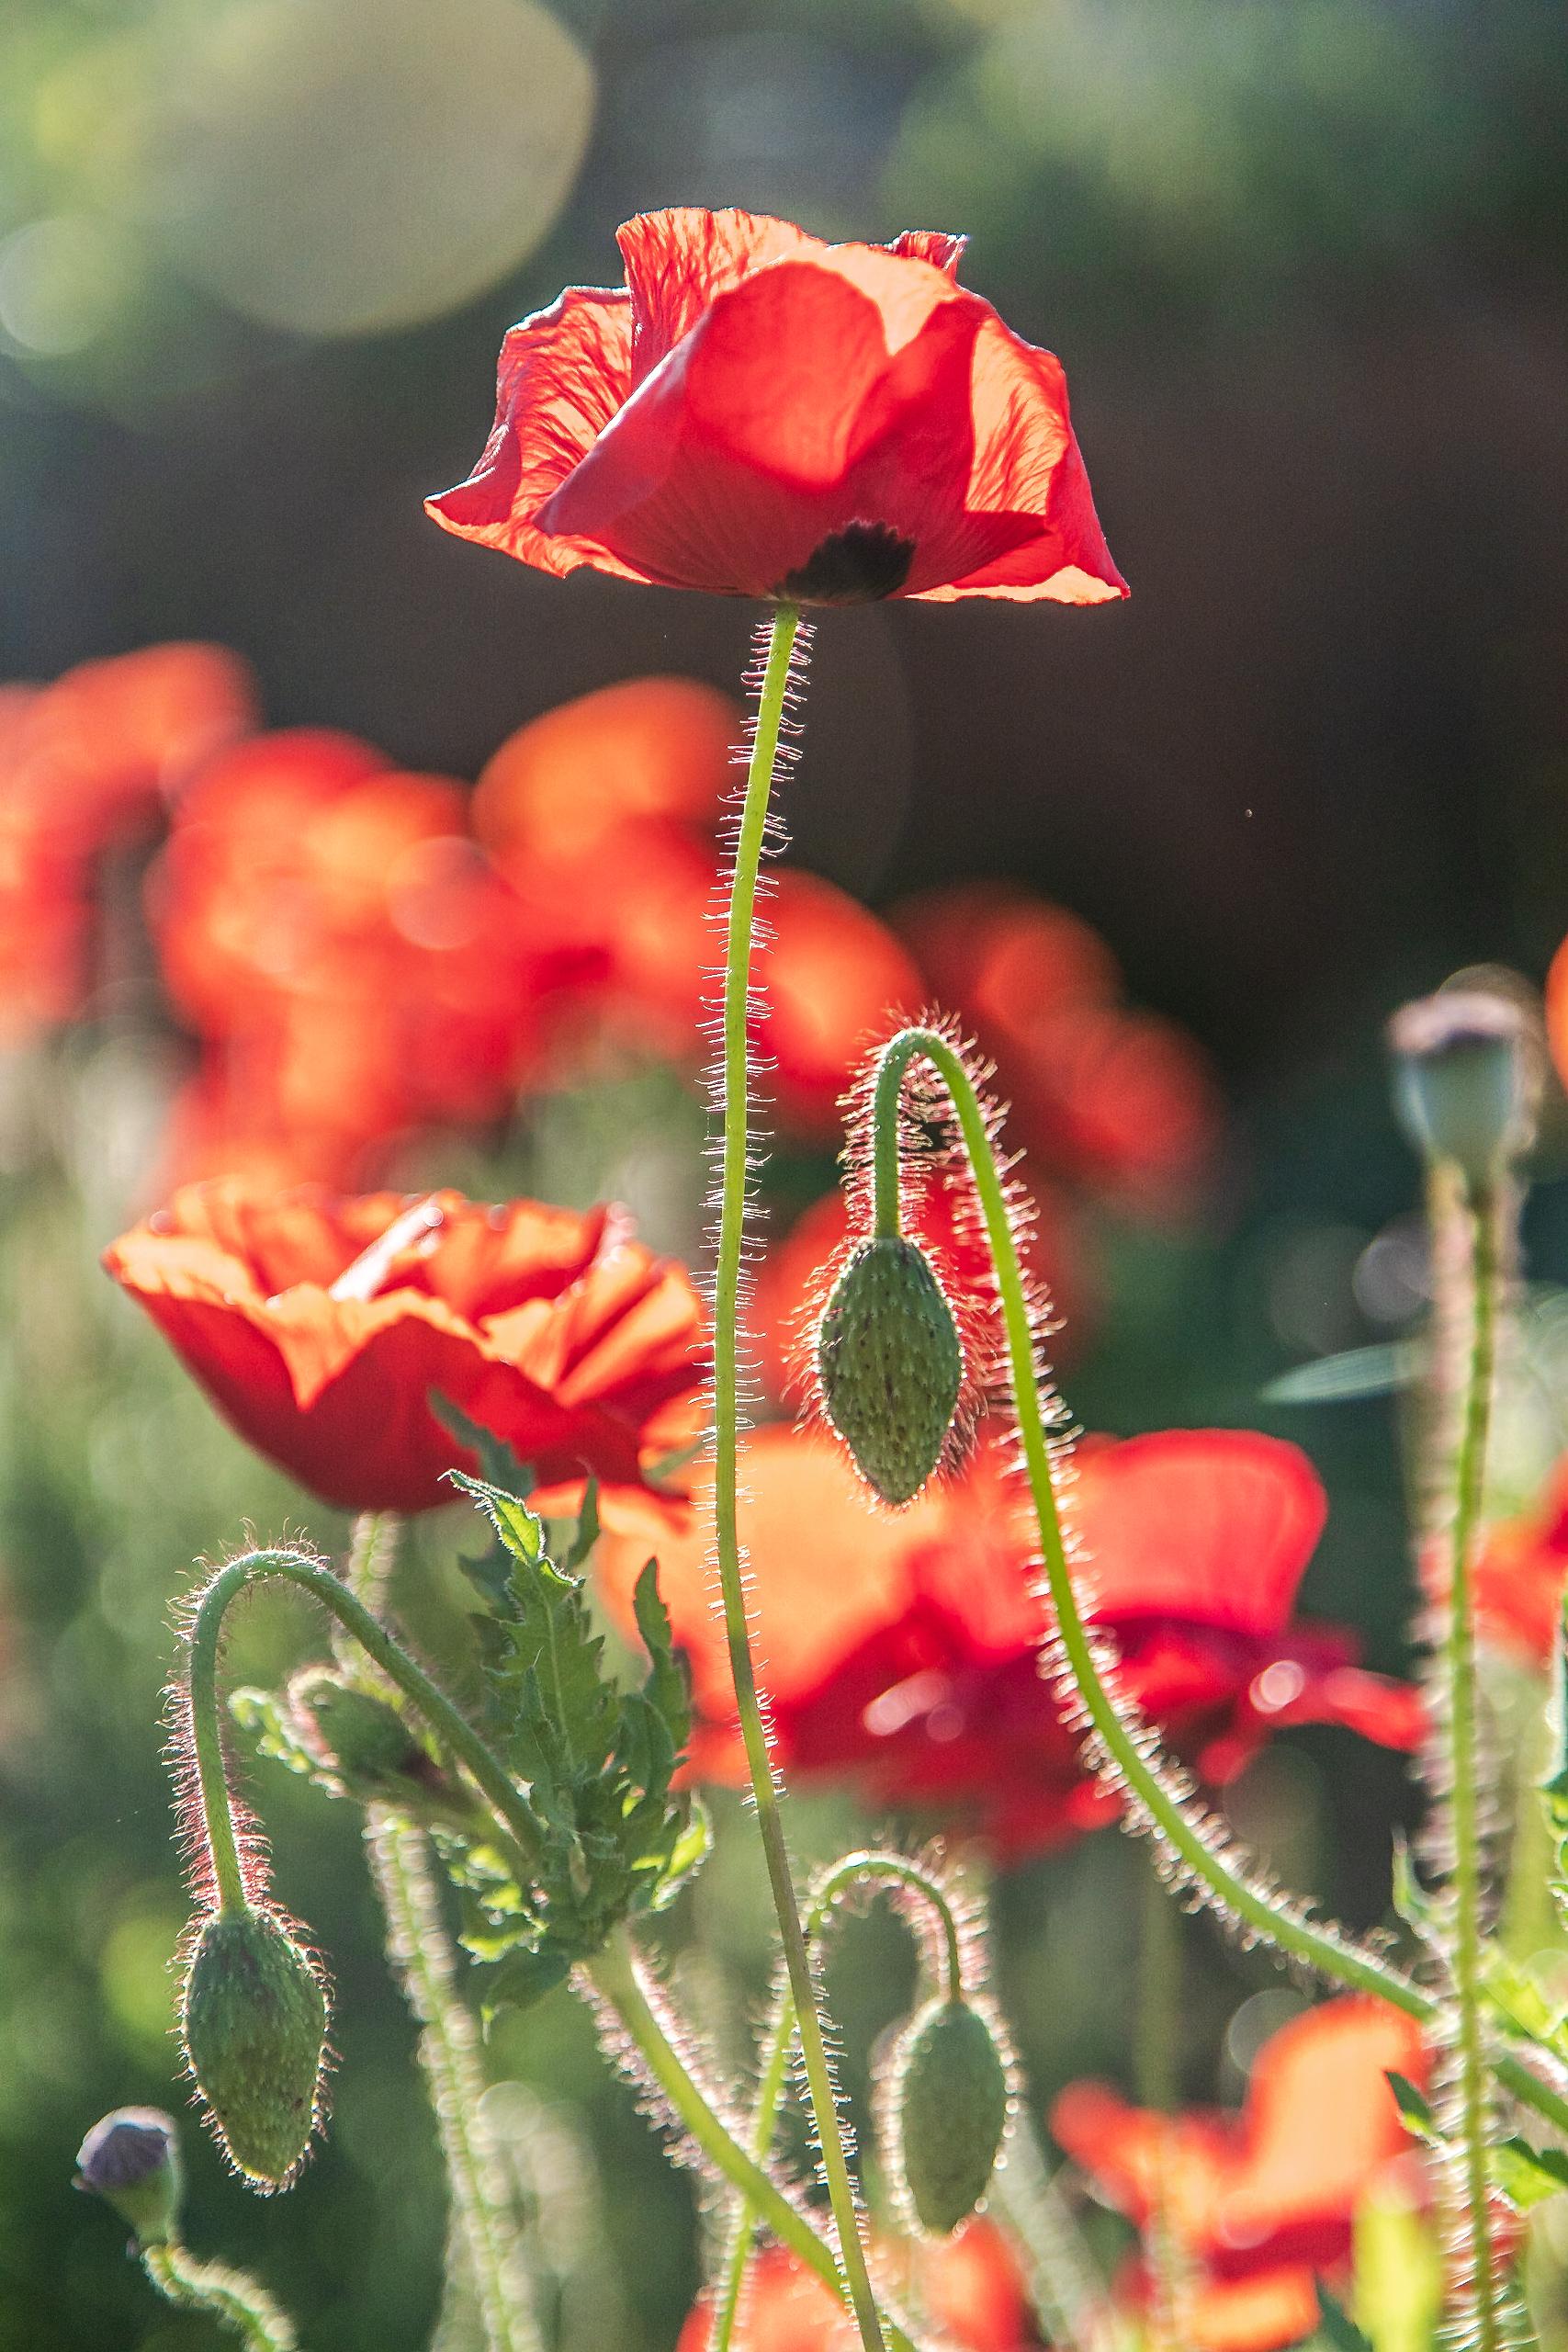 Red Poppy in the sunlight.